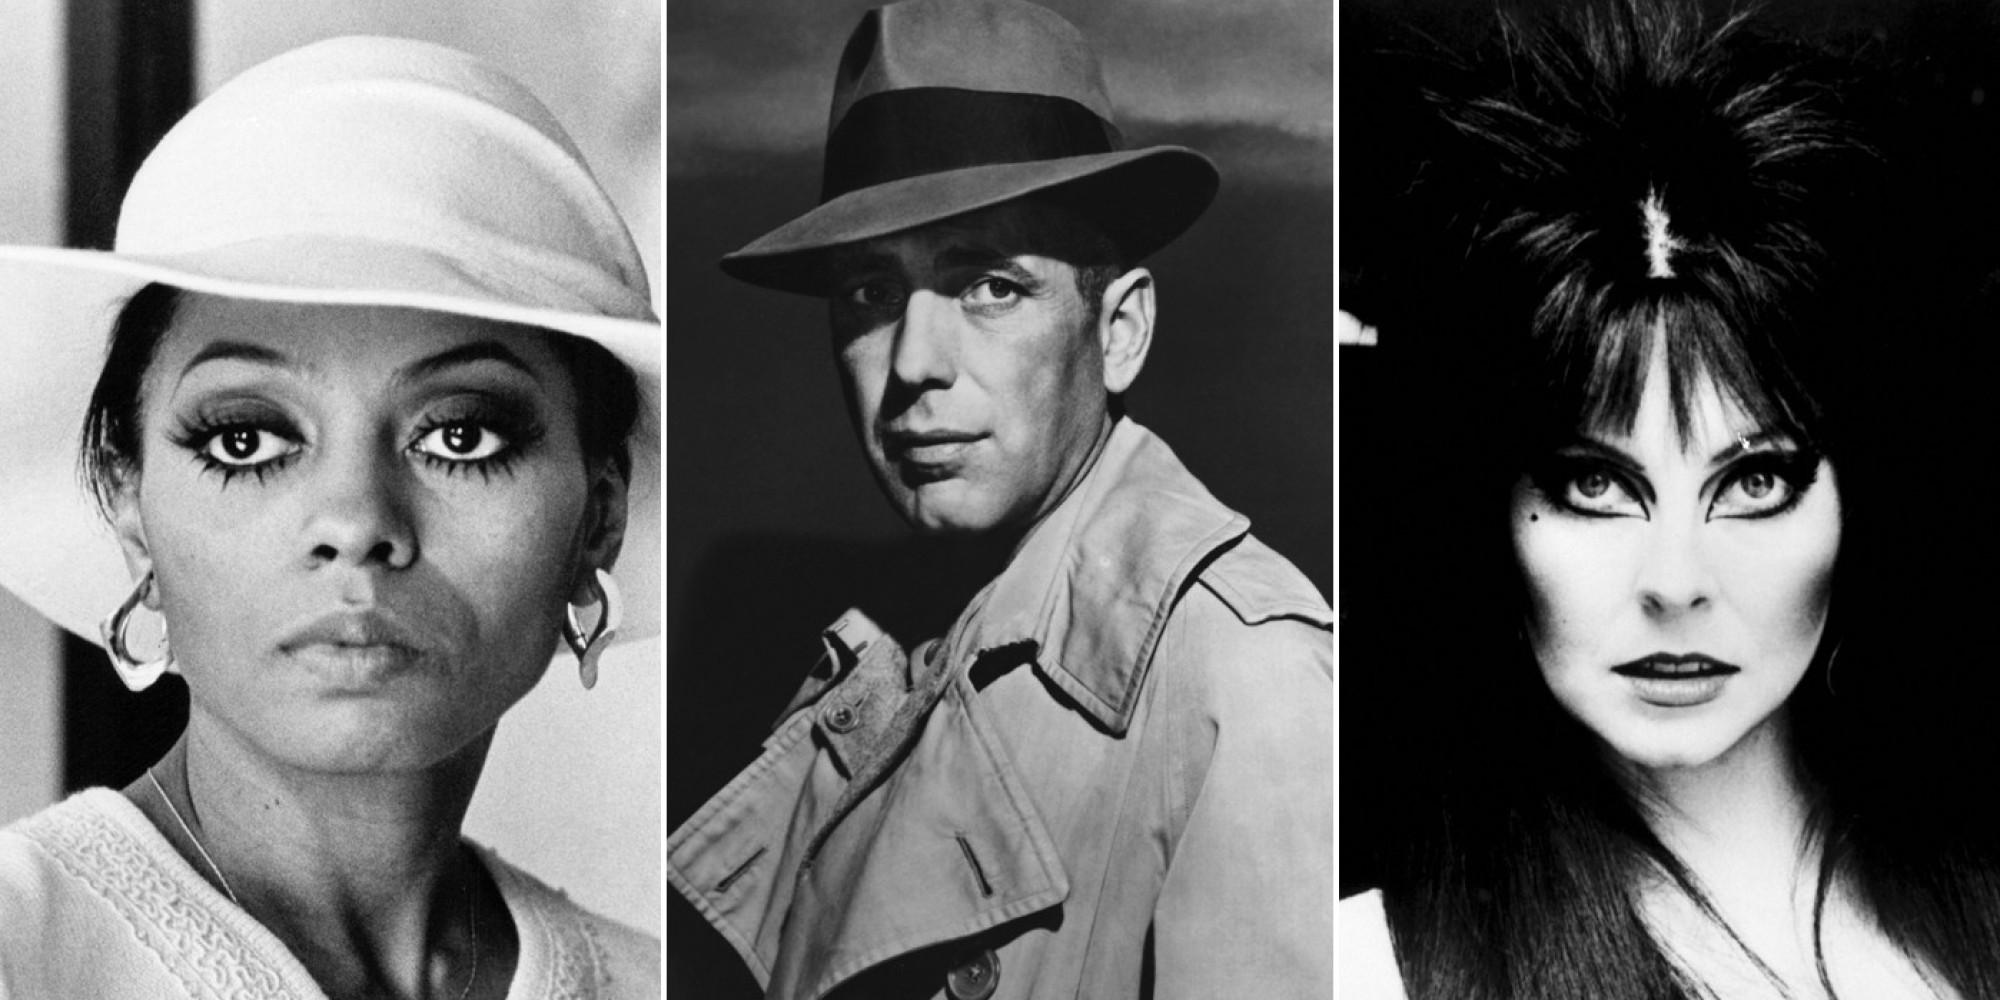 15 Classic TV & Movie Characters That Make Stylish Halloween ...